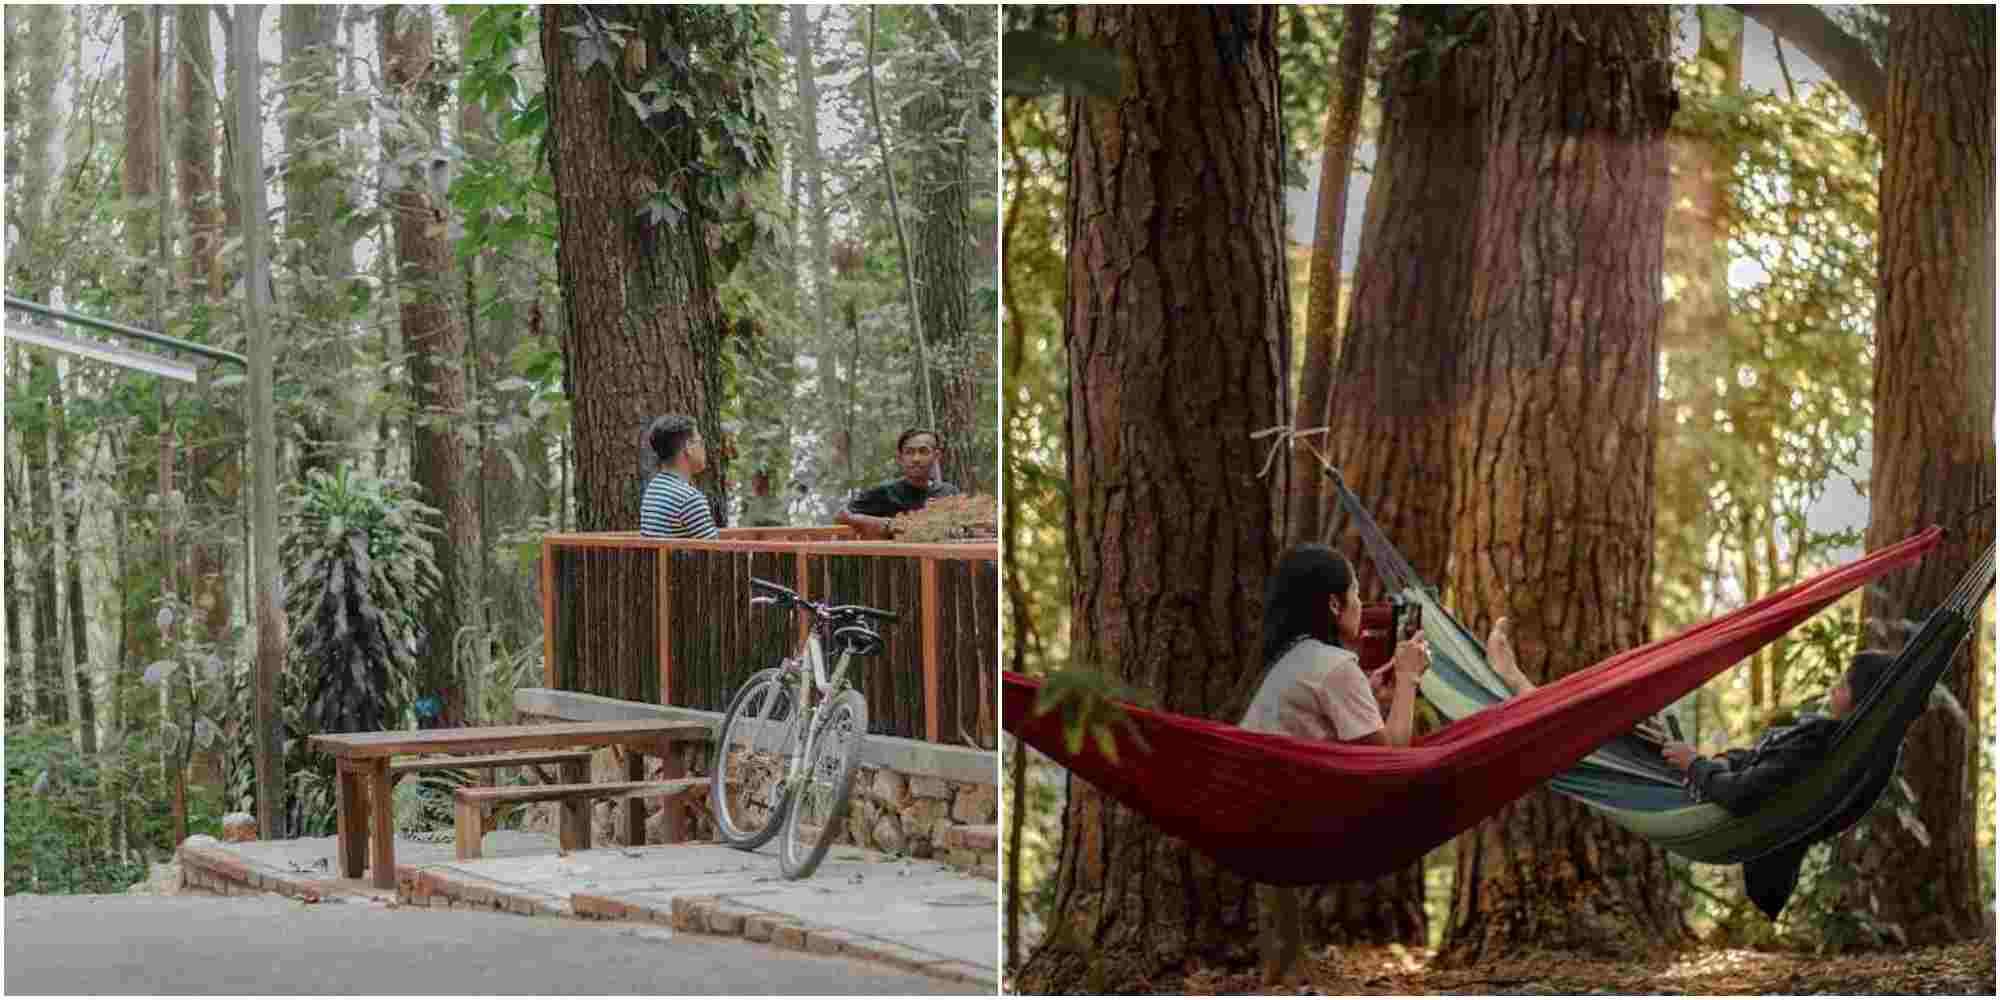 Dalemwangi Bed & Brew | cafe hutan bandung